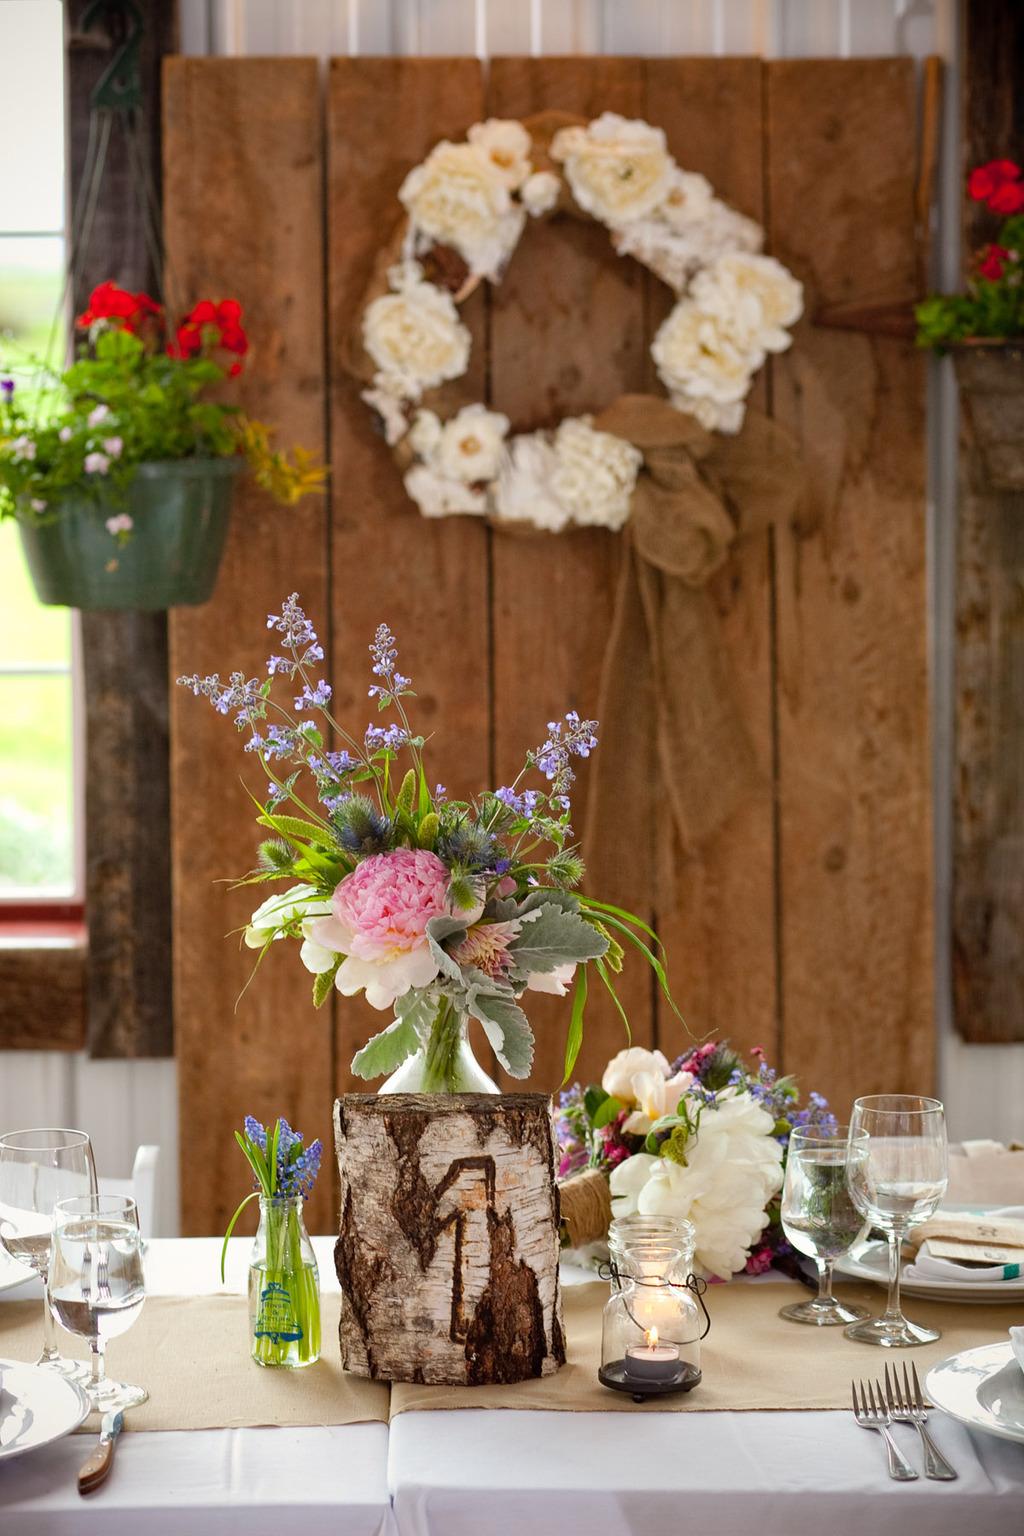 Wedding Ideas Blog Lisawola: Unique Rustic Wedding ...  |Diy Rustic Wedding Table Centerpieces